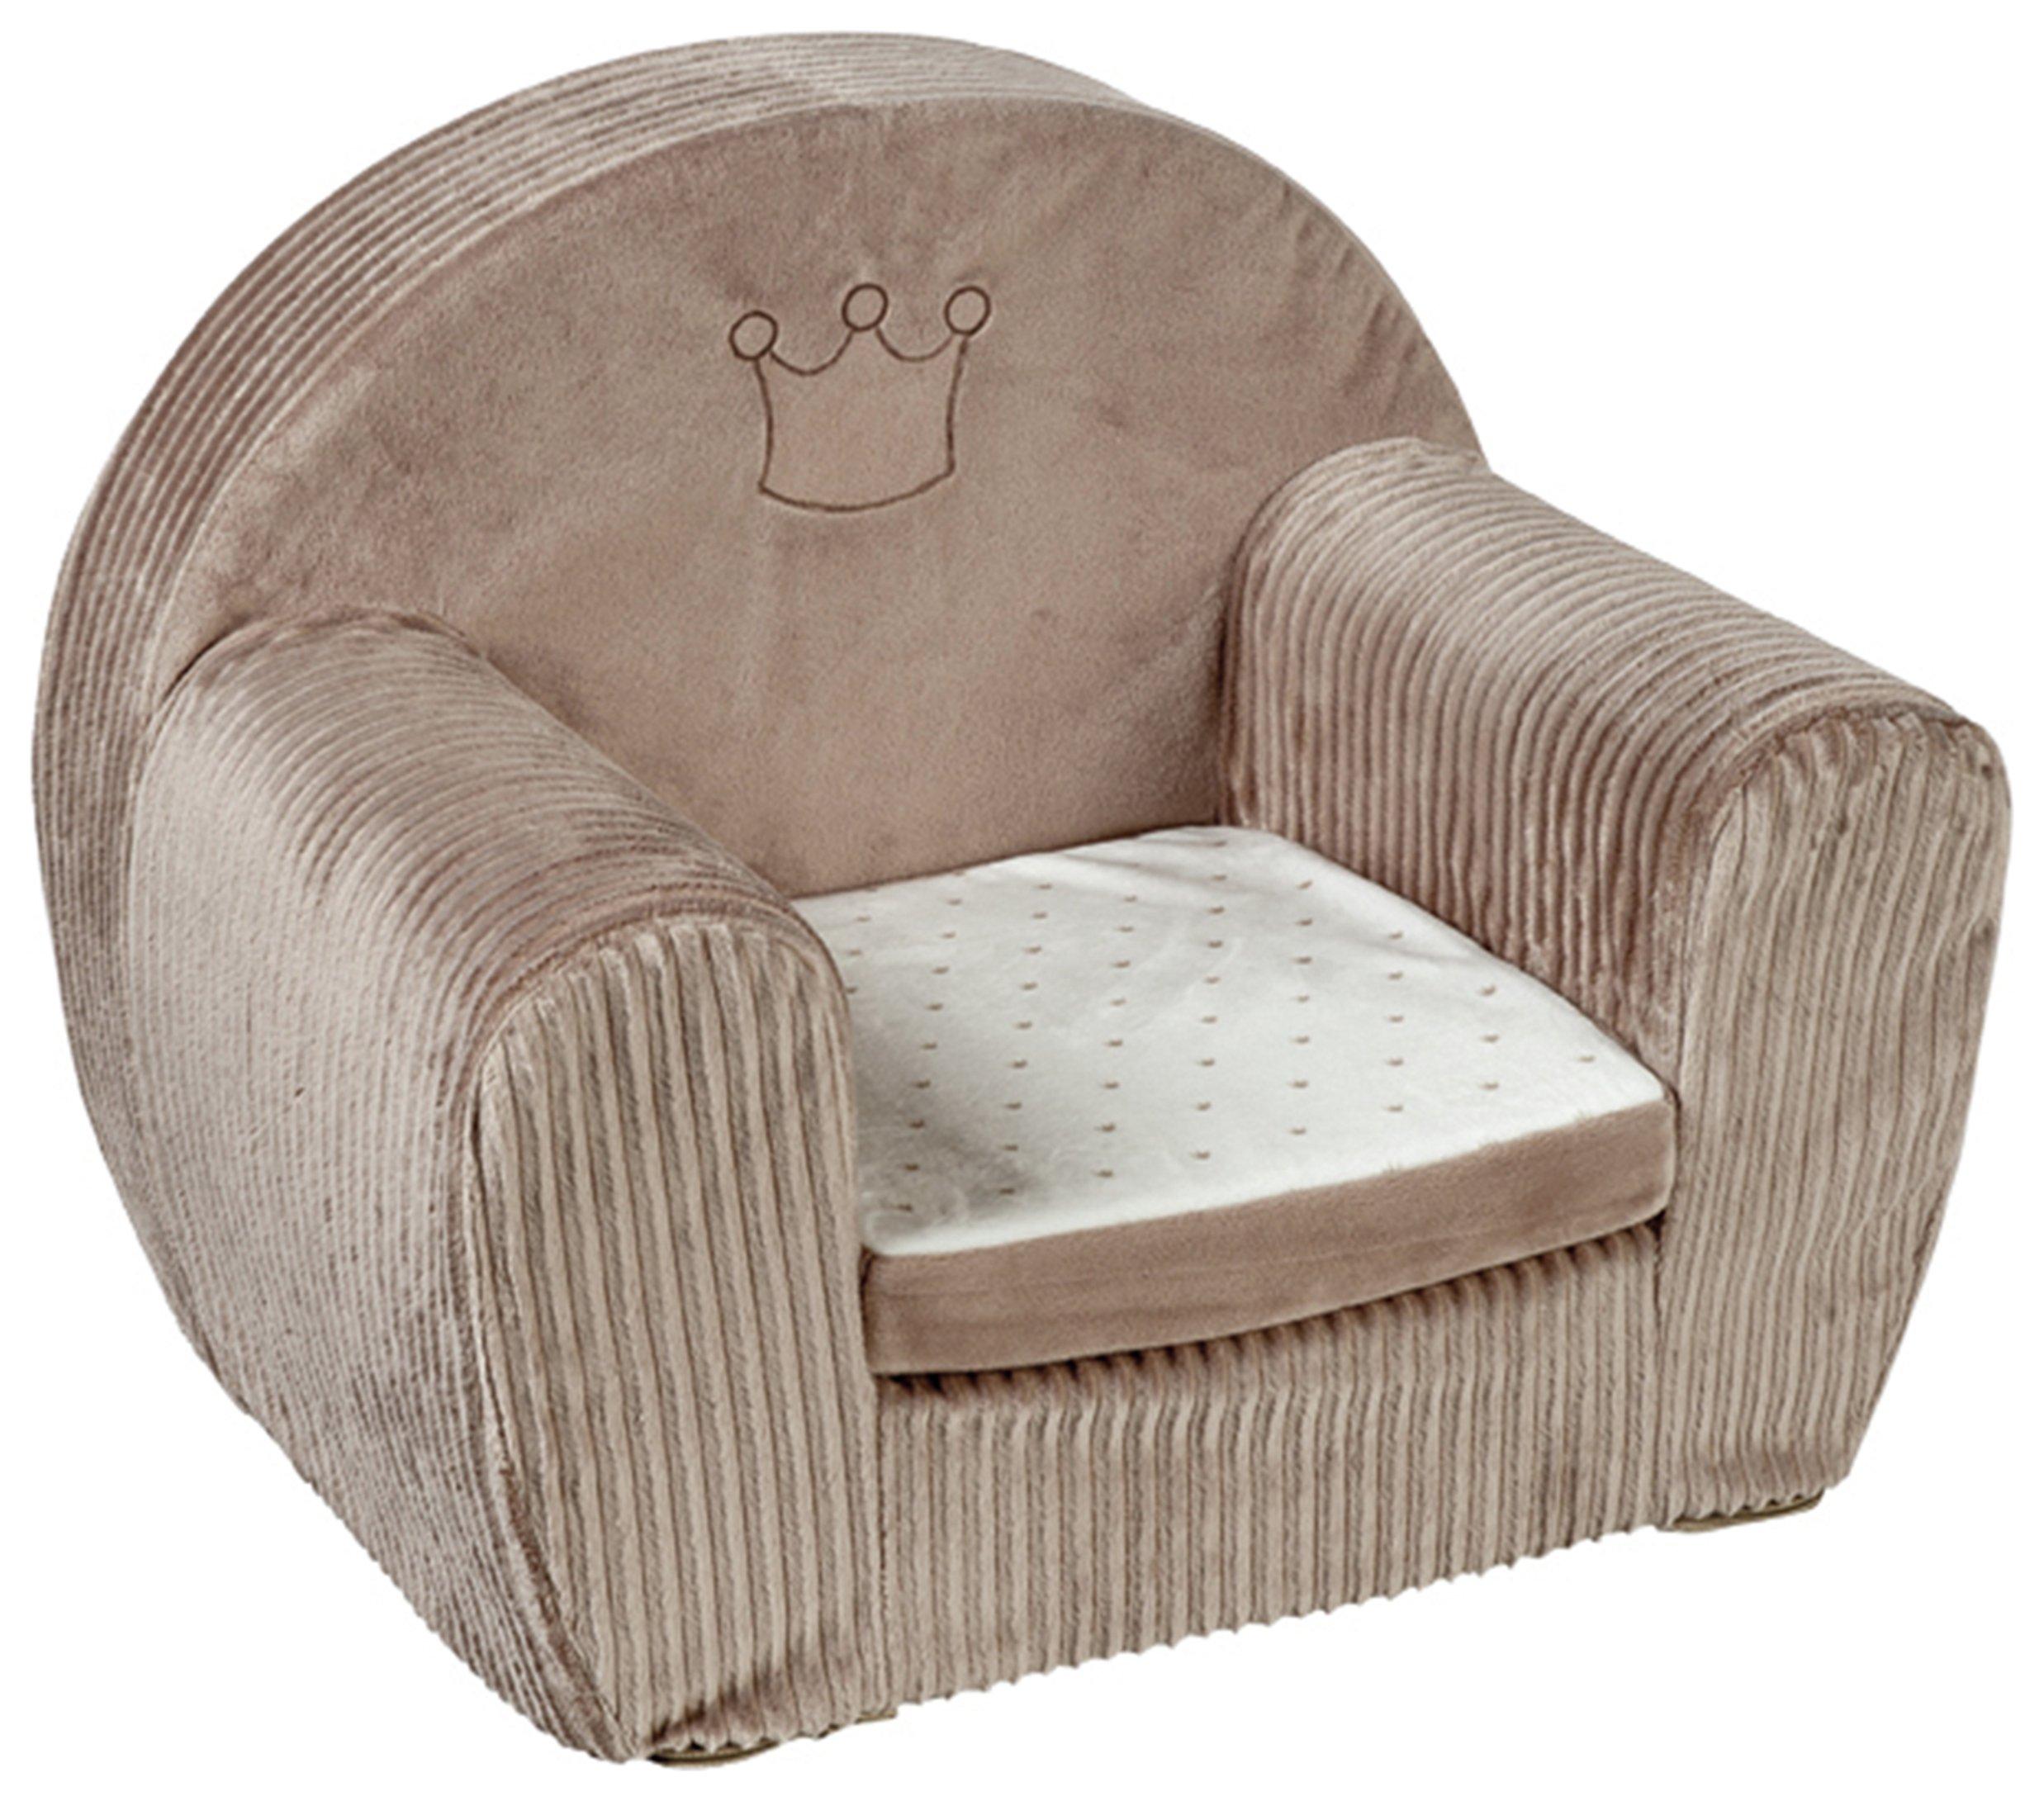 Image of Nattou Max Noa & Tom Nursery Sofa